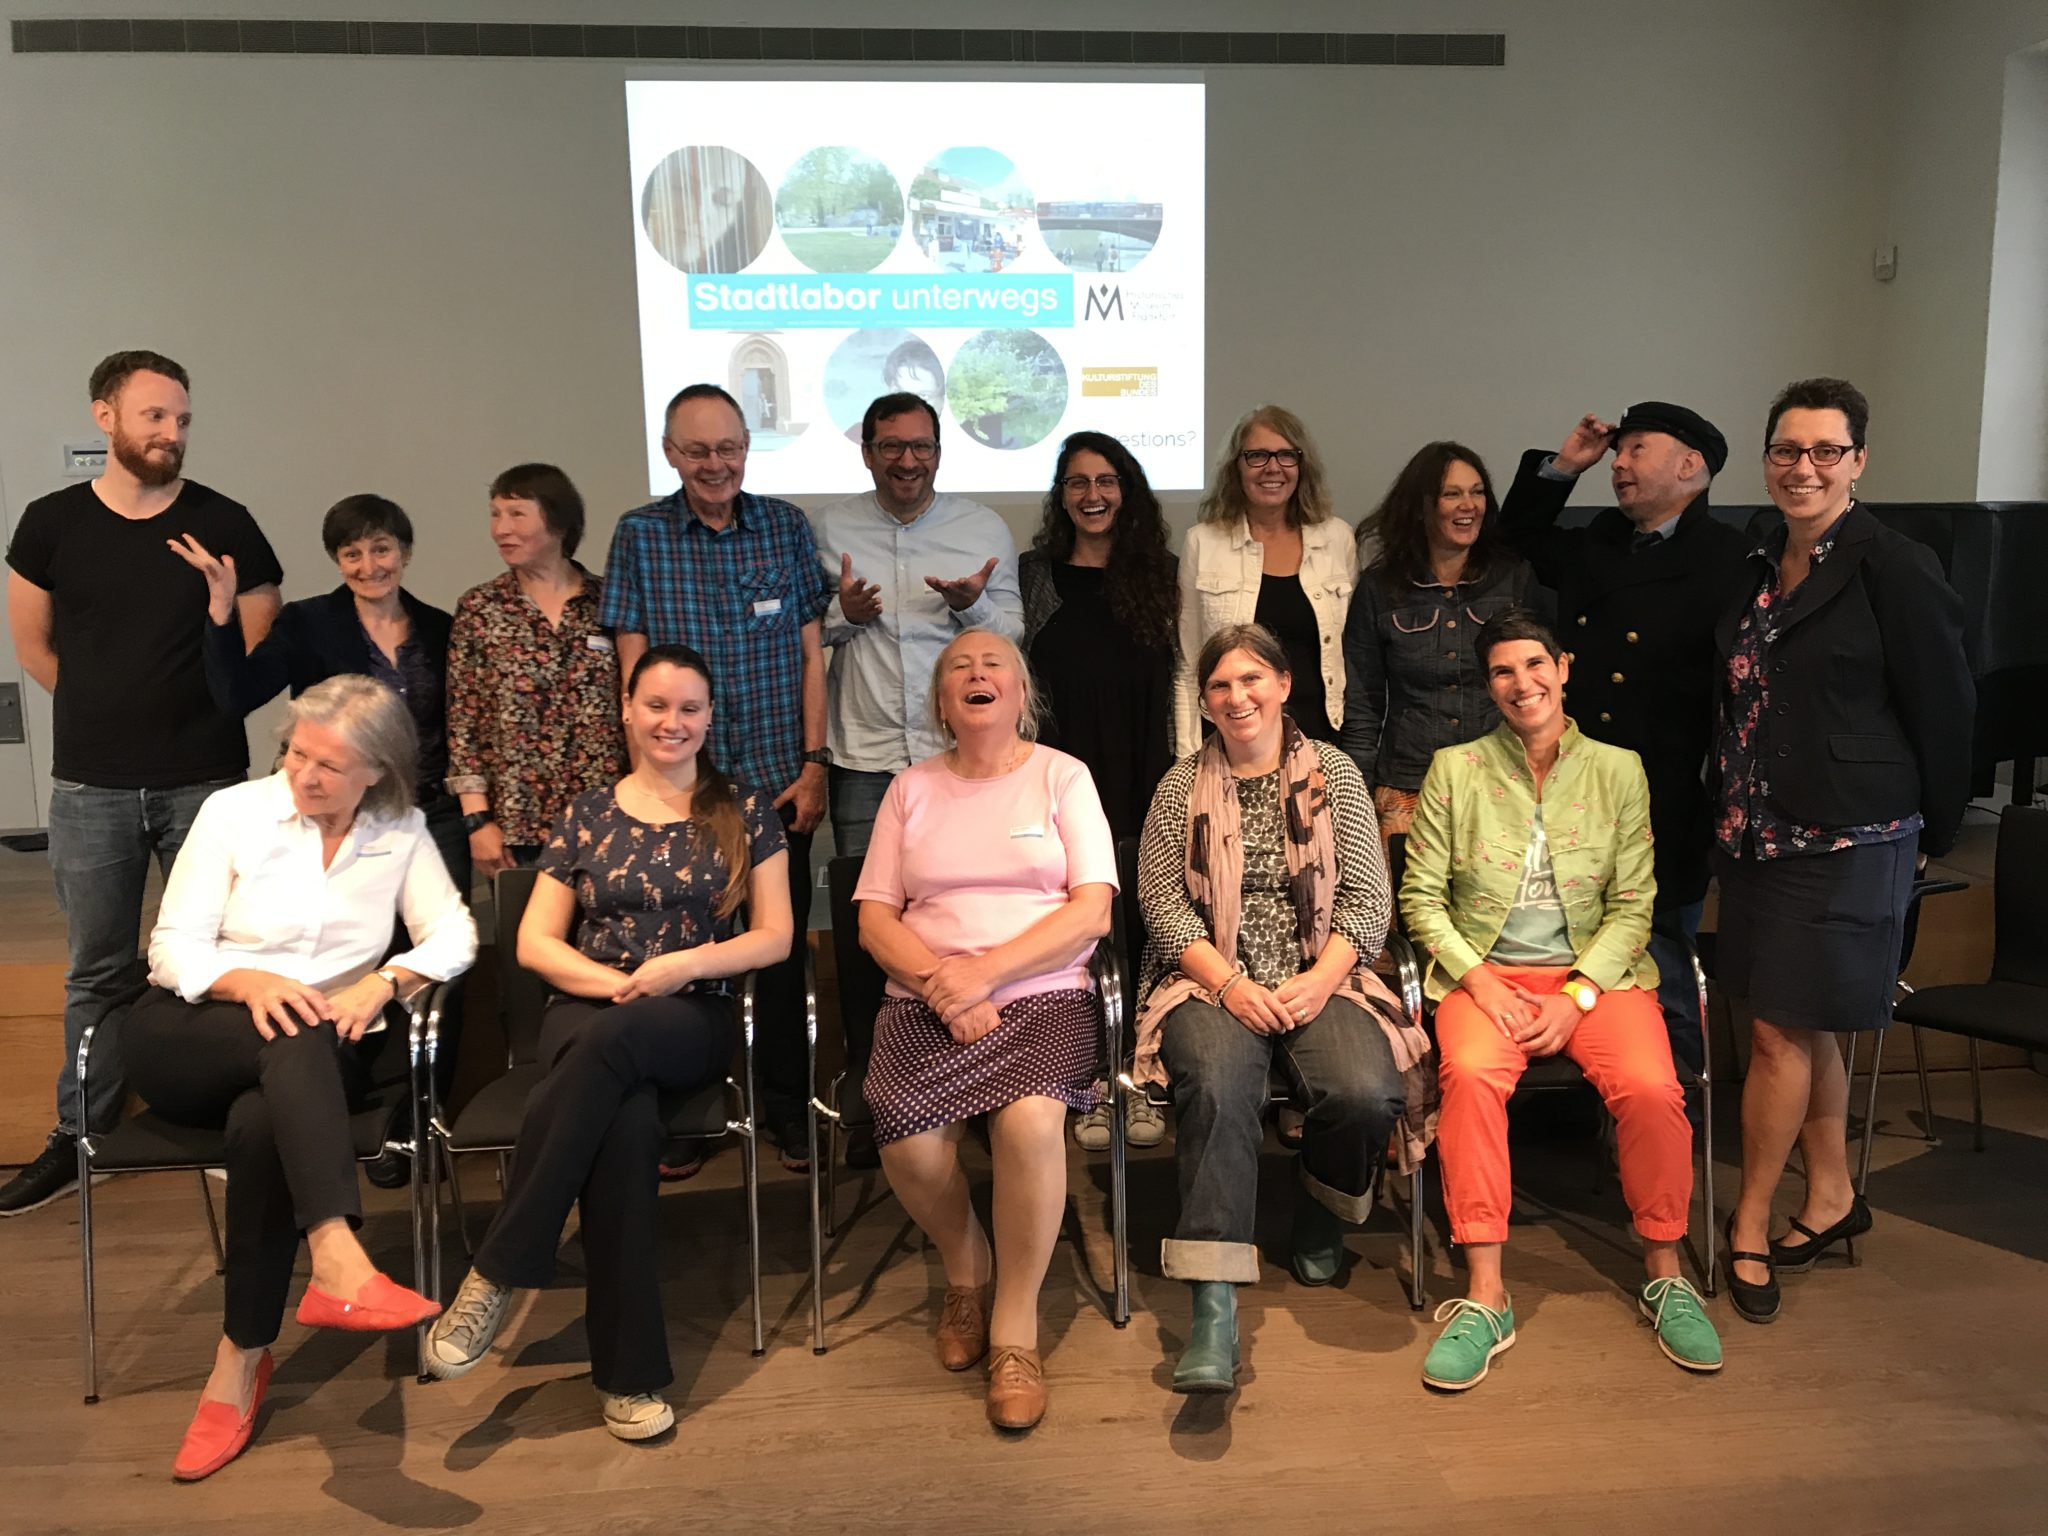 Group photo of Stadtlabor 2017 (12.08.2017)